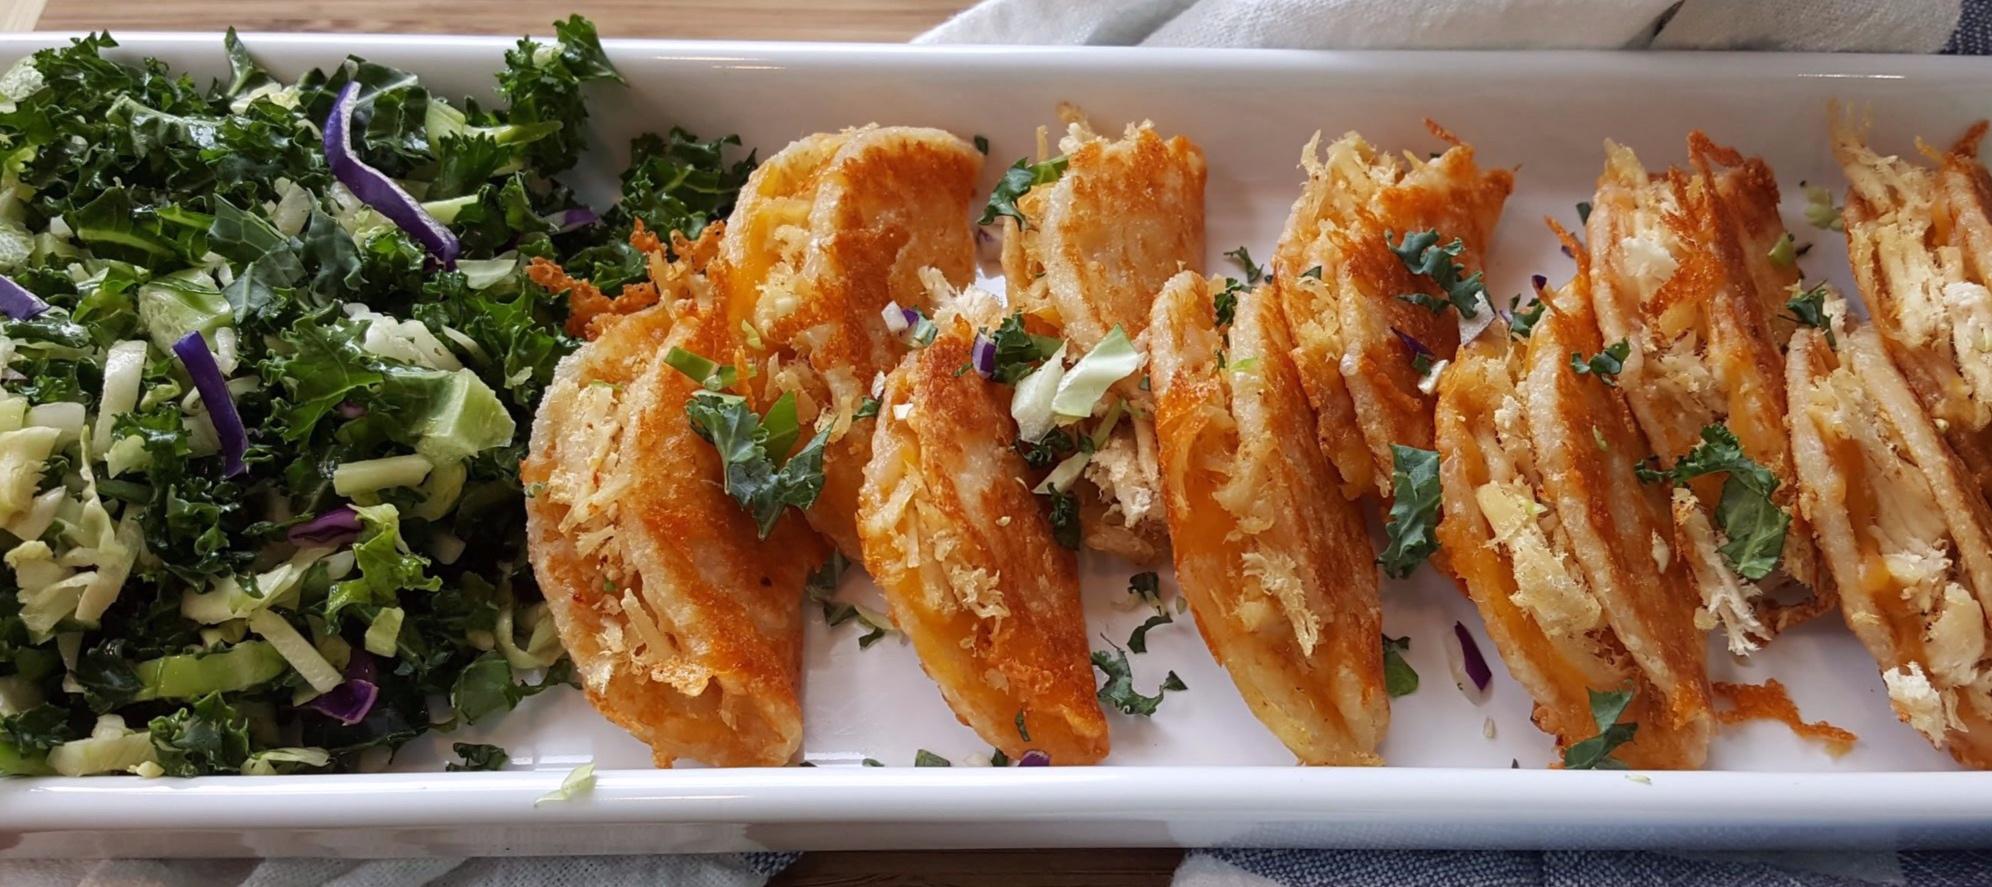 - Mini chicken soft tacos